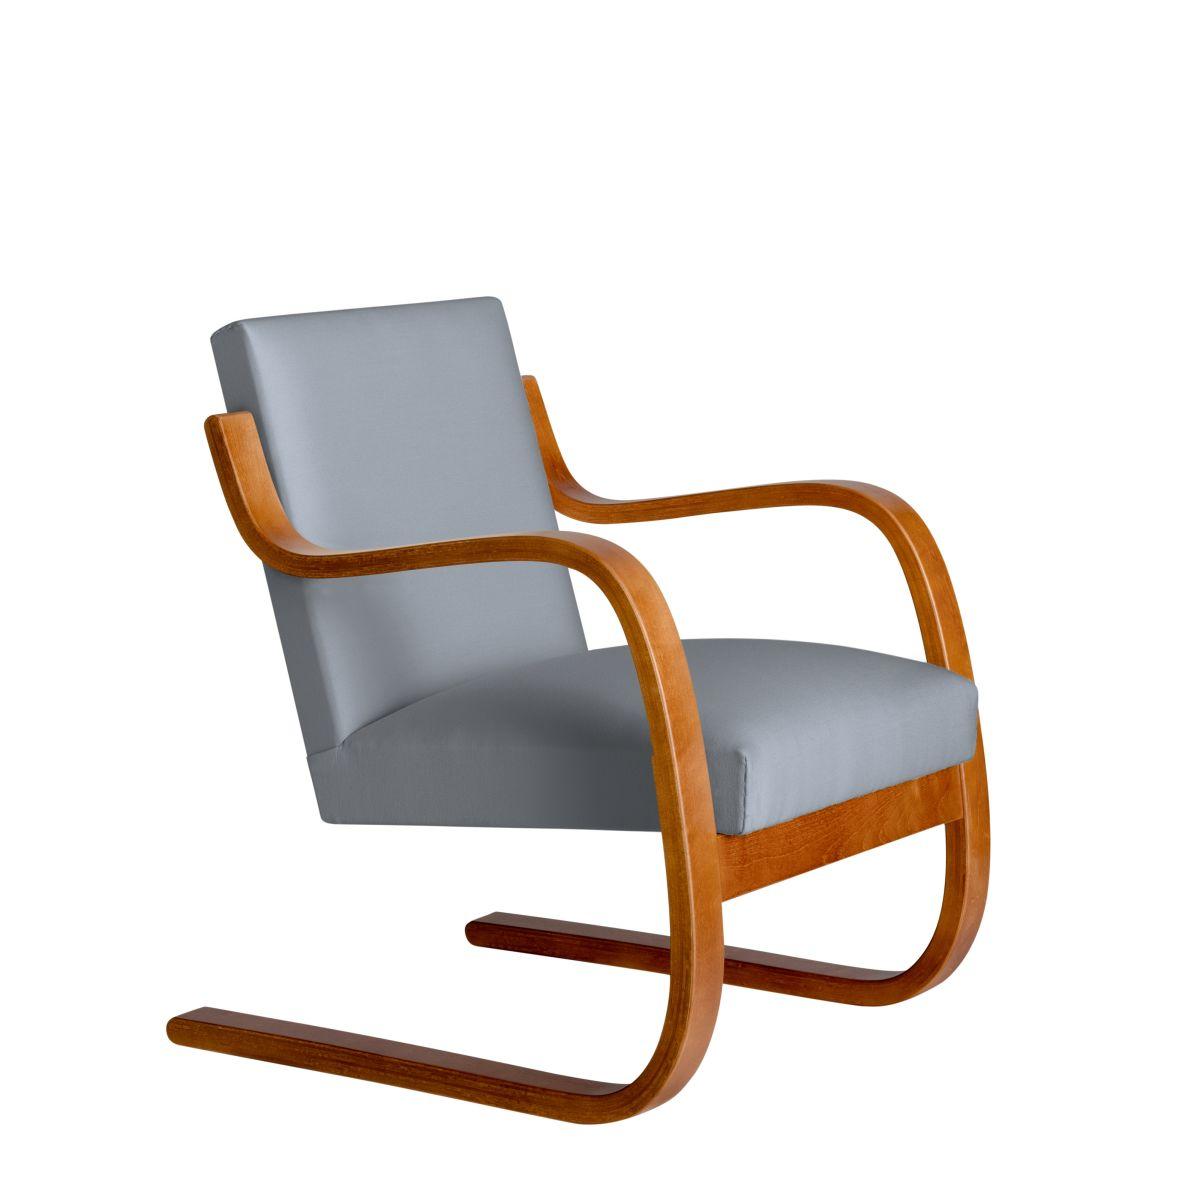 Armchair 402 Birch Honey Stain Seat Fabric Upholstery Artek Grey 2494508